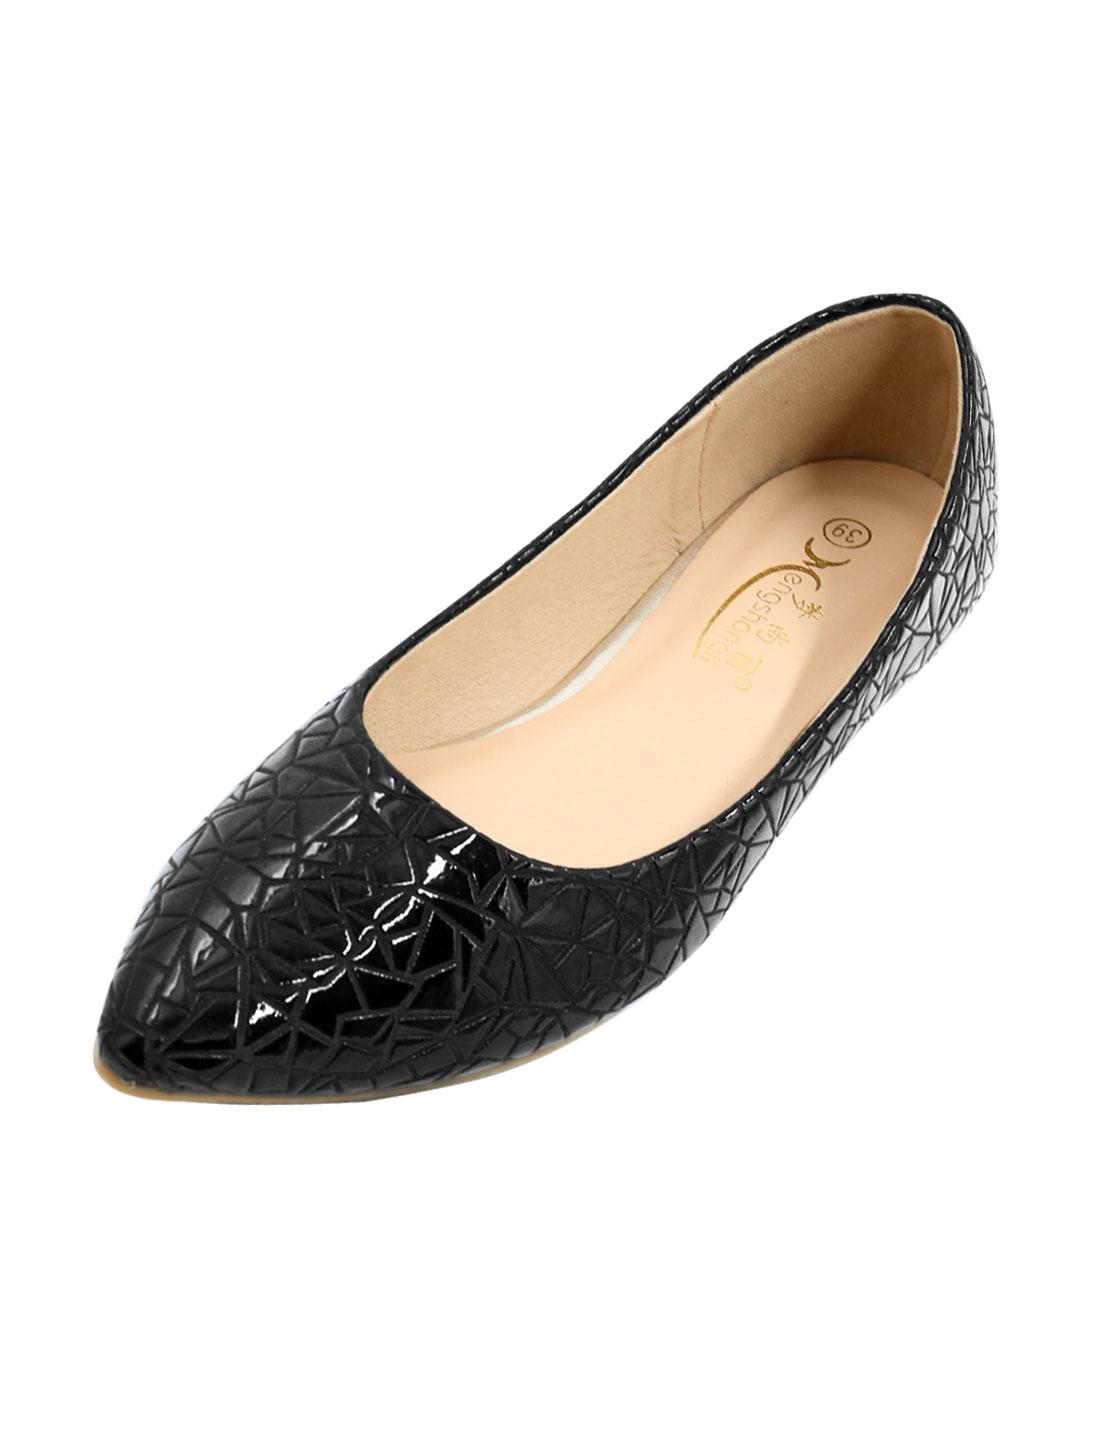 Women Pointed Toe Crocodile Effect PU Leisure Flats Black US 8